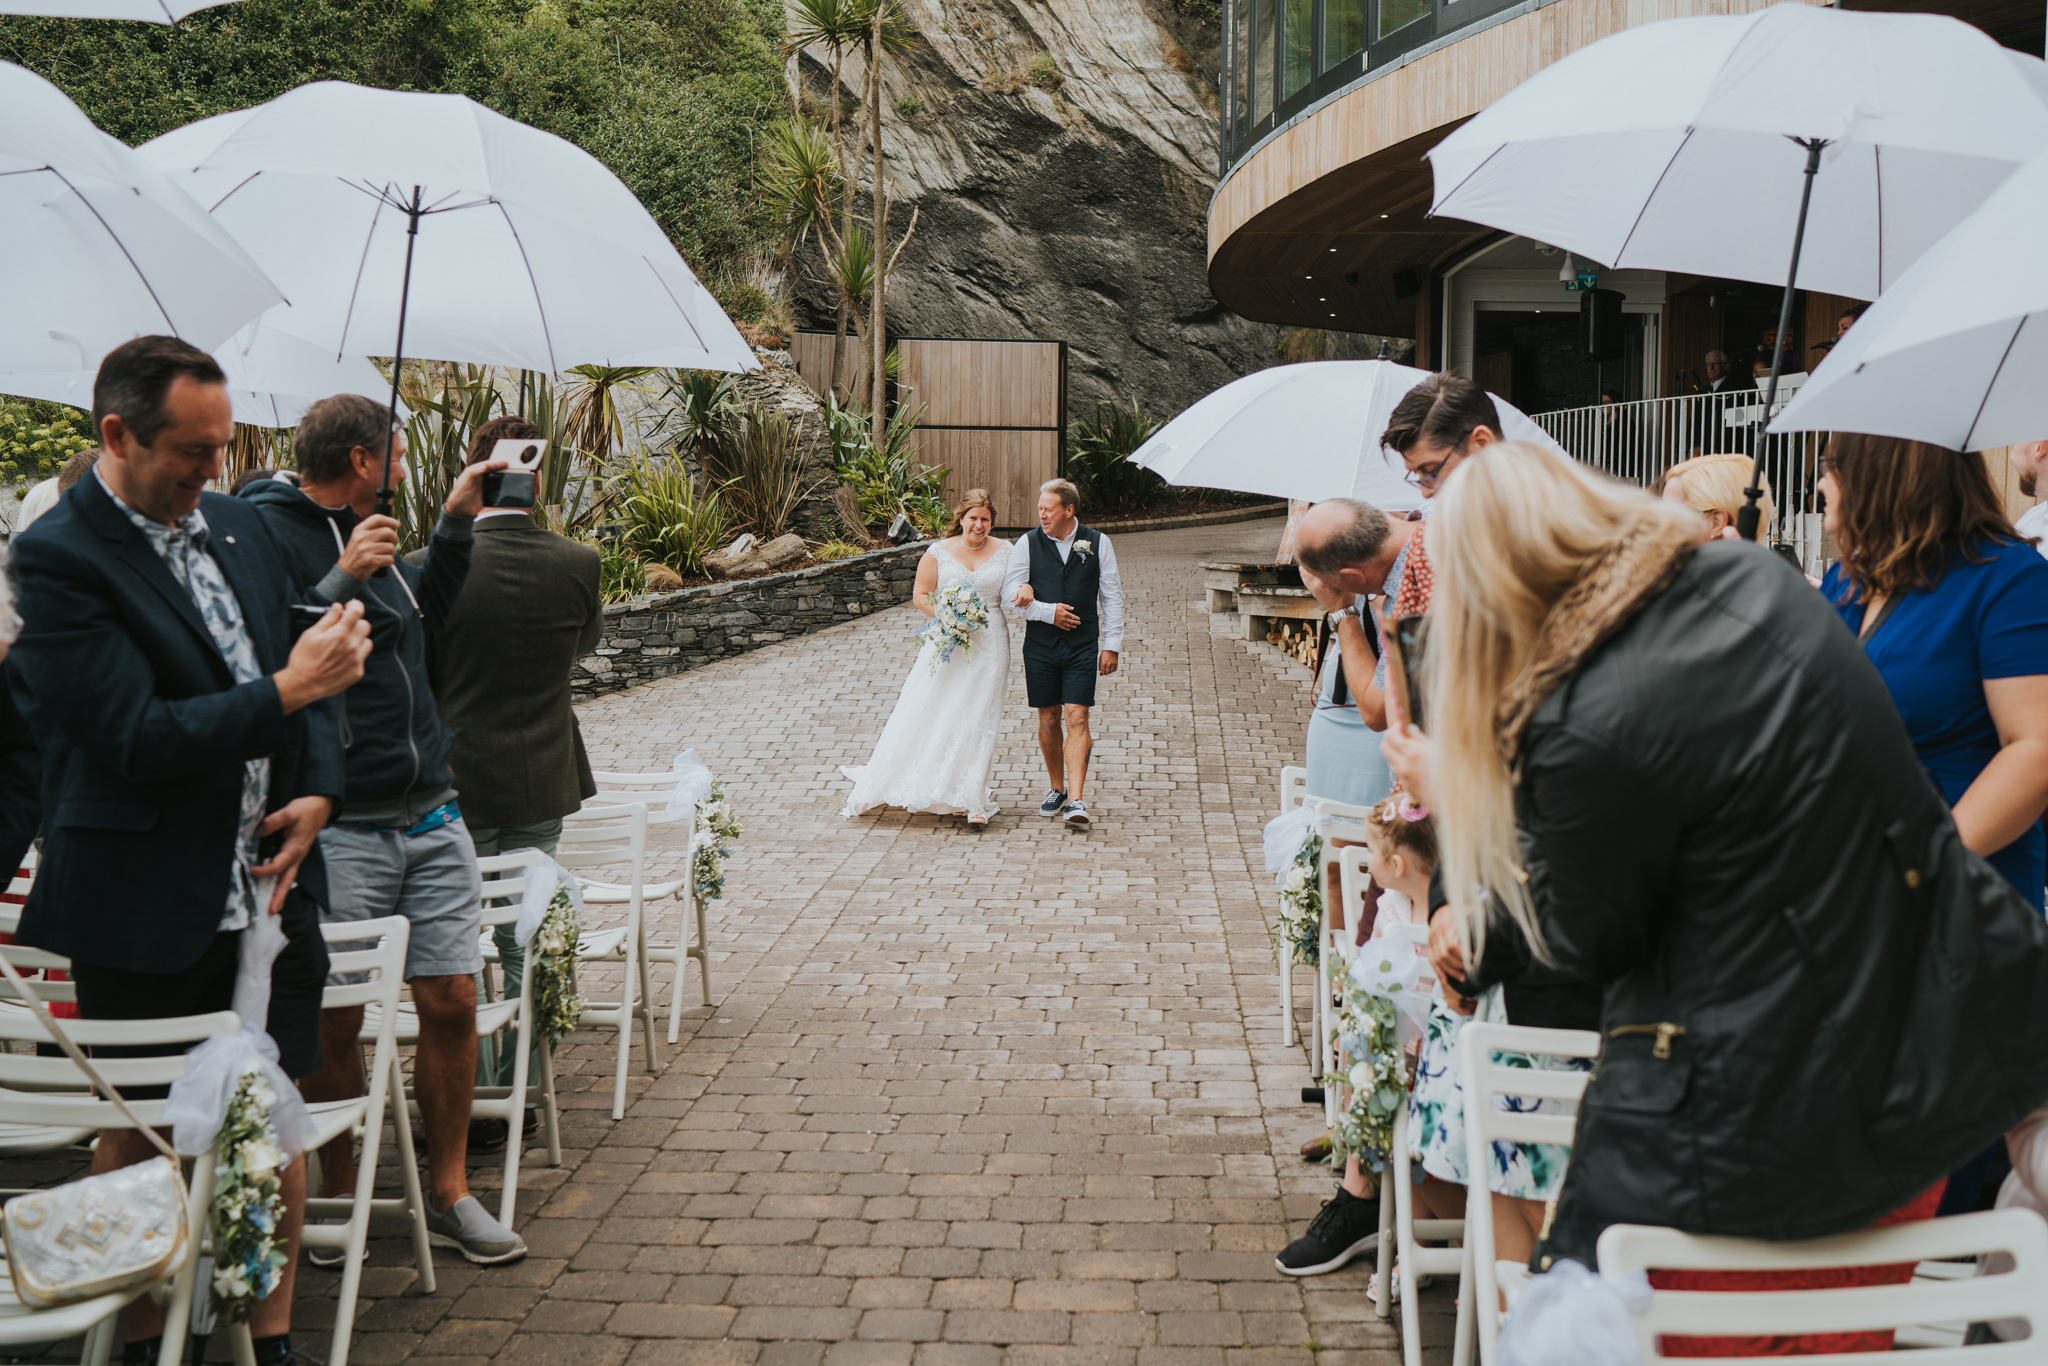 john-amy-relaxed-beach-wedding-tunnels-beaches-ilfracombe-north-devon-grace-elizabeth-colchester-essex-alternative-relaxed-wedding-photography-devon-suffolk-norfolk-essex (48 of 159).jpg